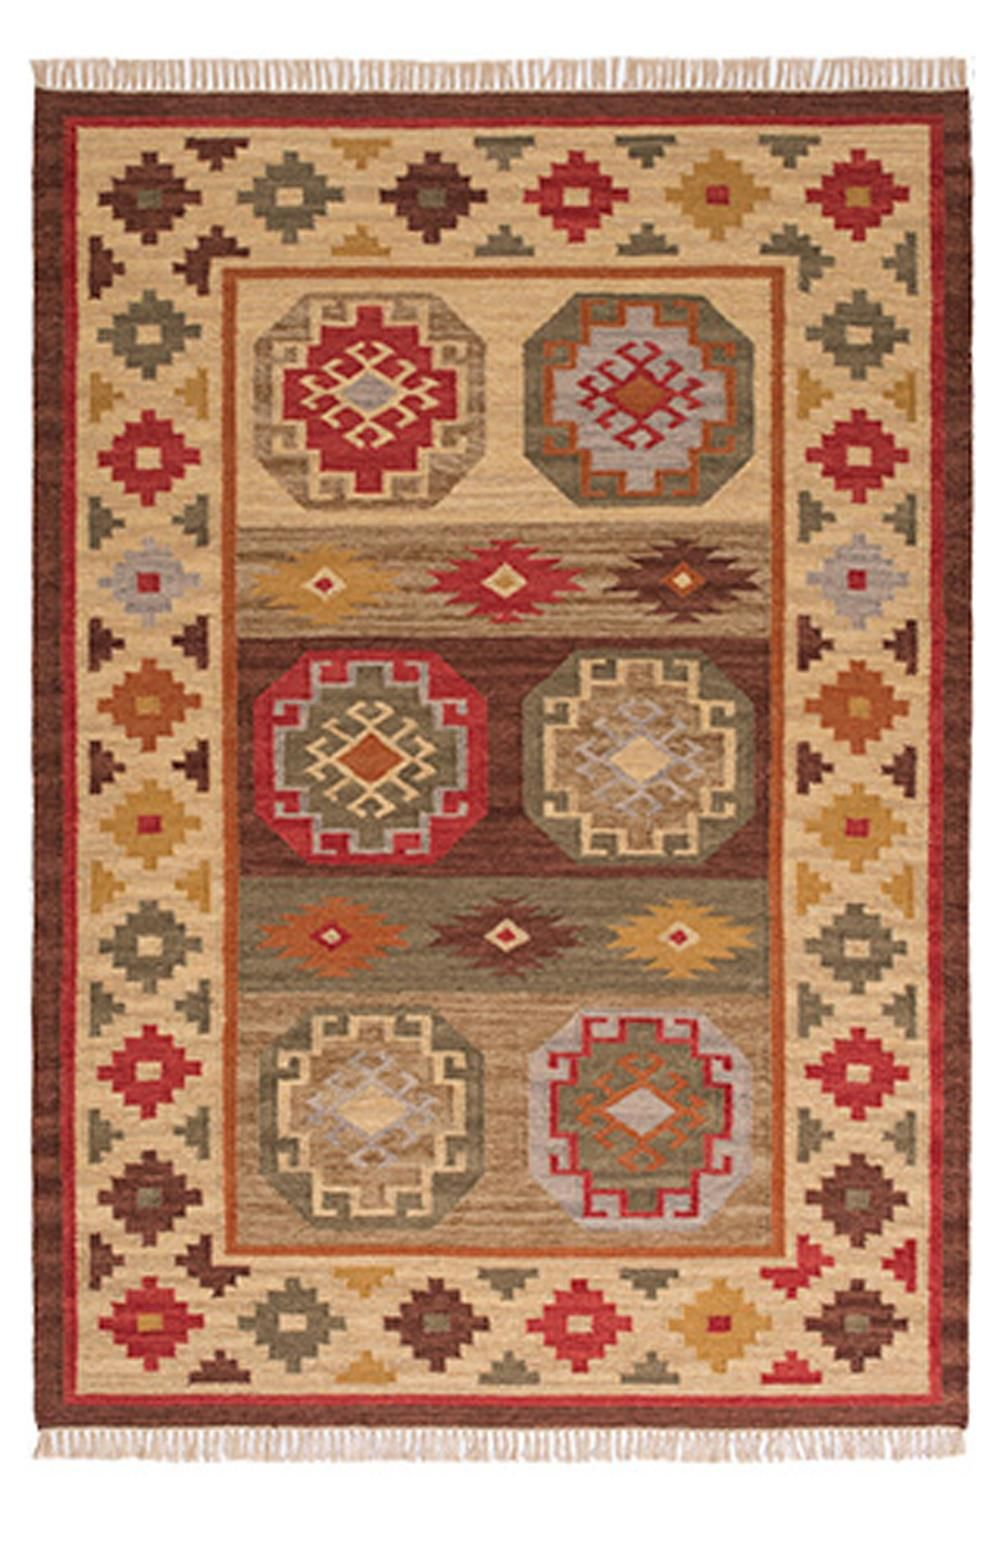 Kohra Brown Red Orange Multi Coloured Geometric Wool Kilim Rug